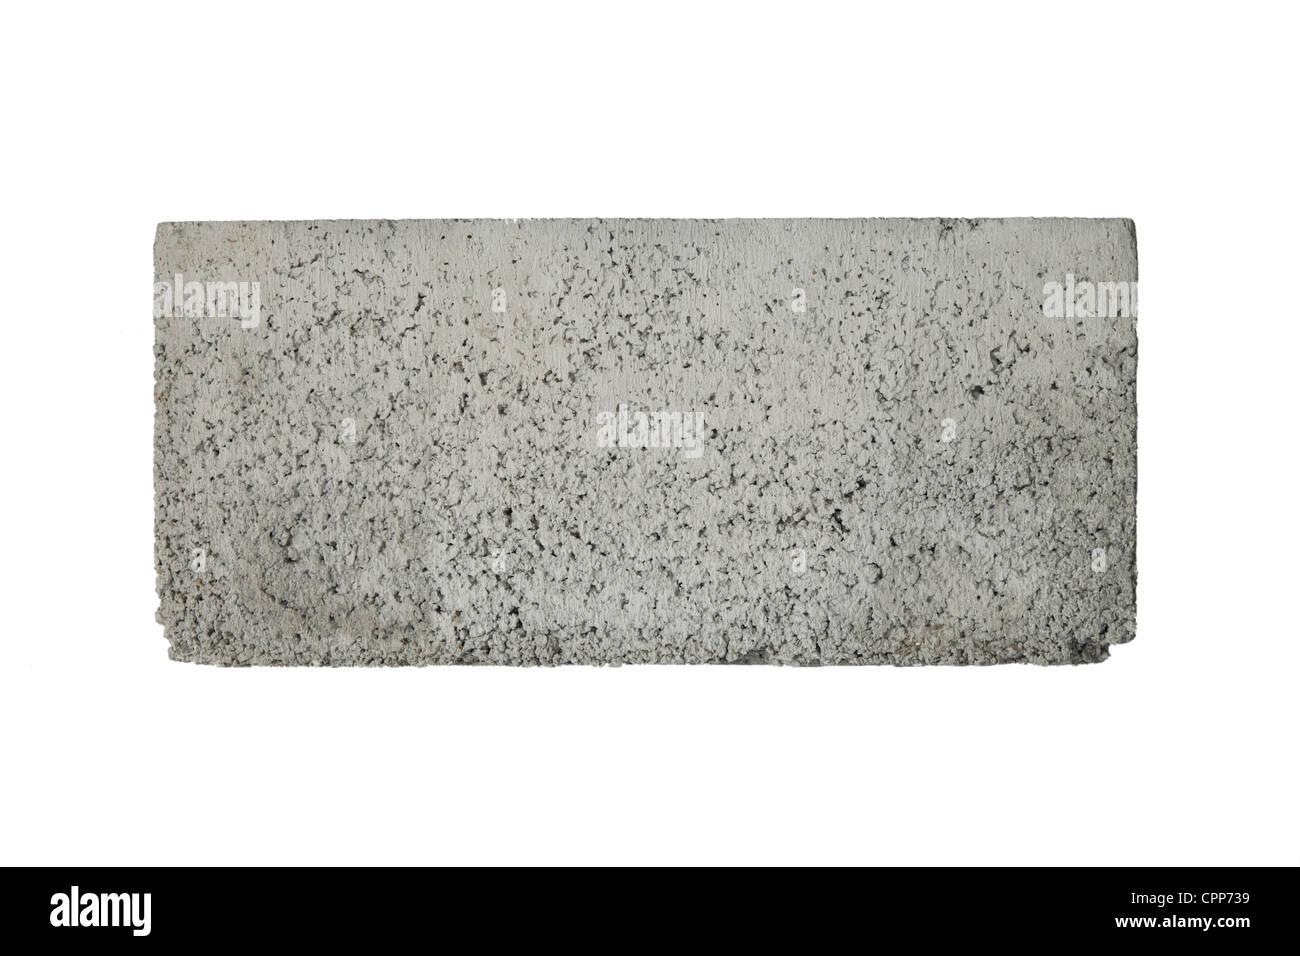 Concrete block isolated on white - Stock Image